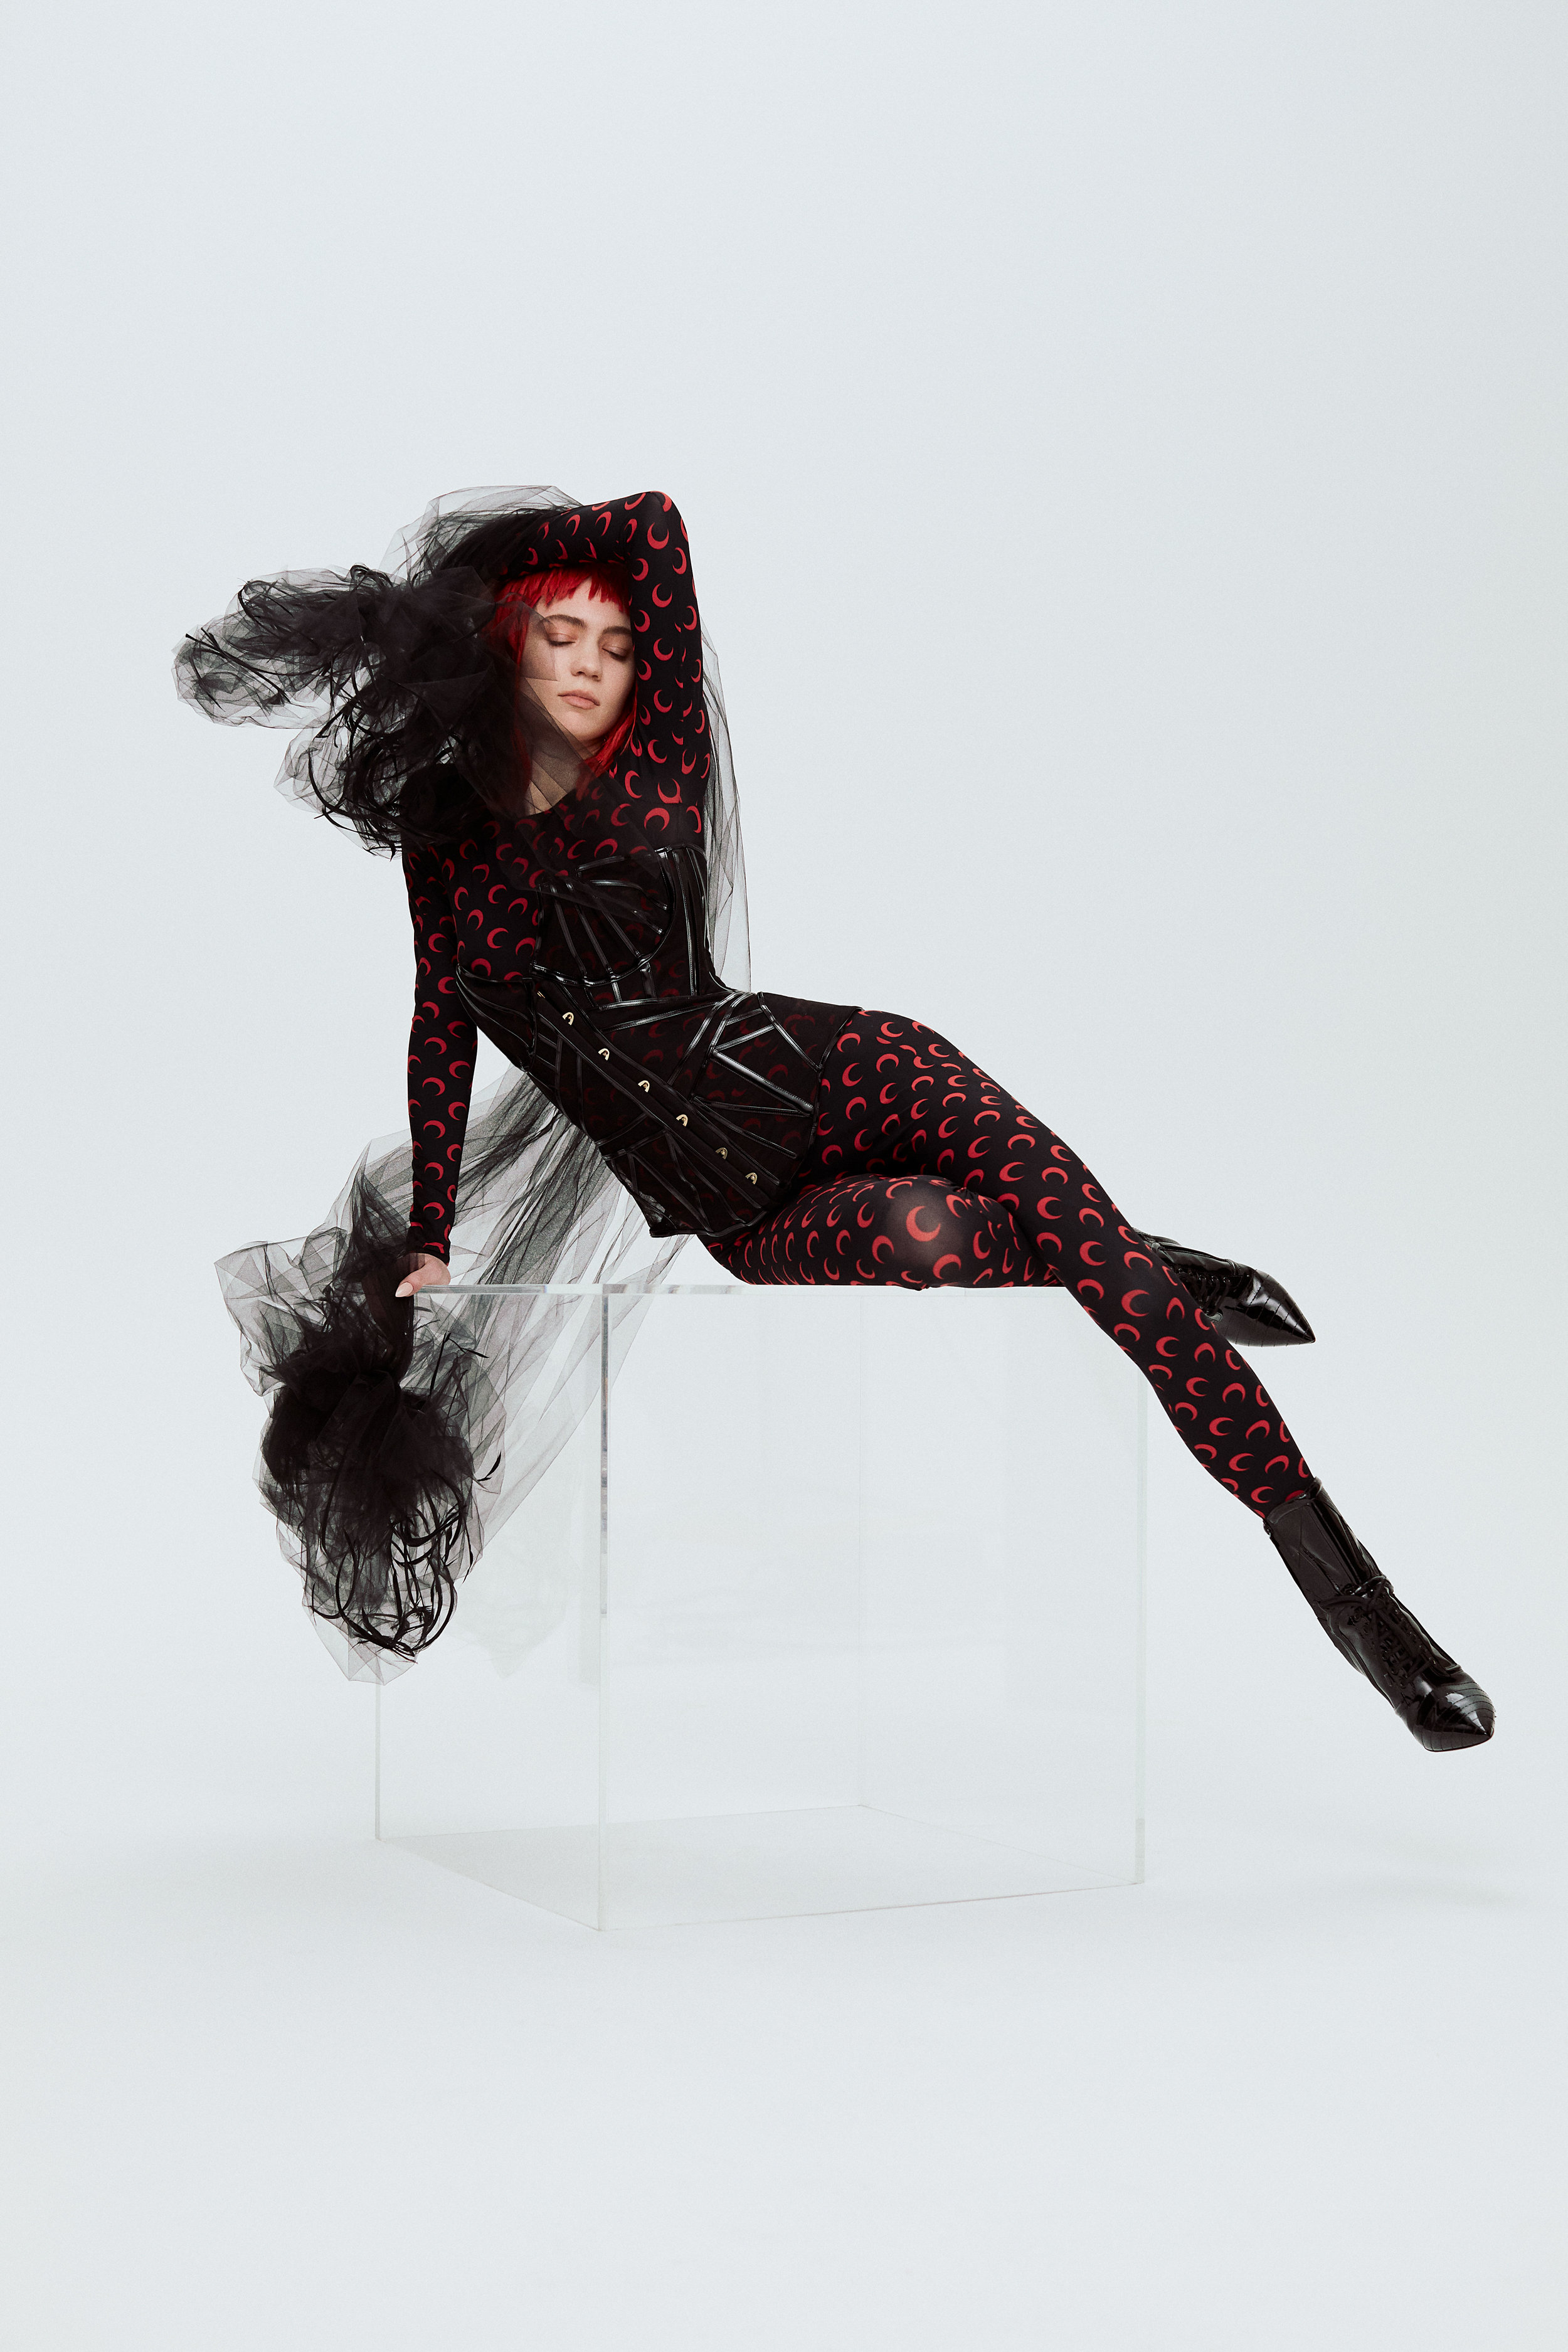 ALIONA KONONOVA     cape,   MARINE SERRE     bodysuit,   AGENT PROVOCATEUR     bustier, and   MOSCHINO     boots.